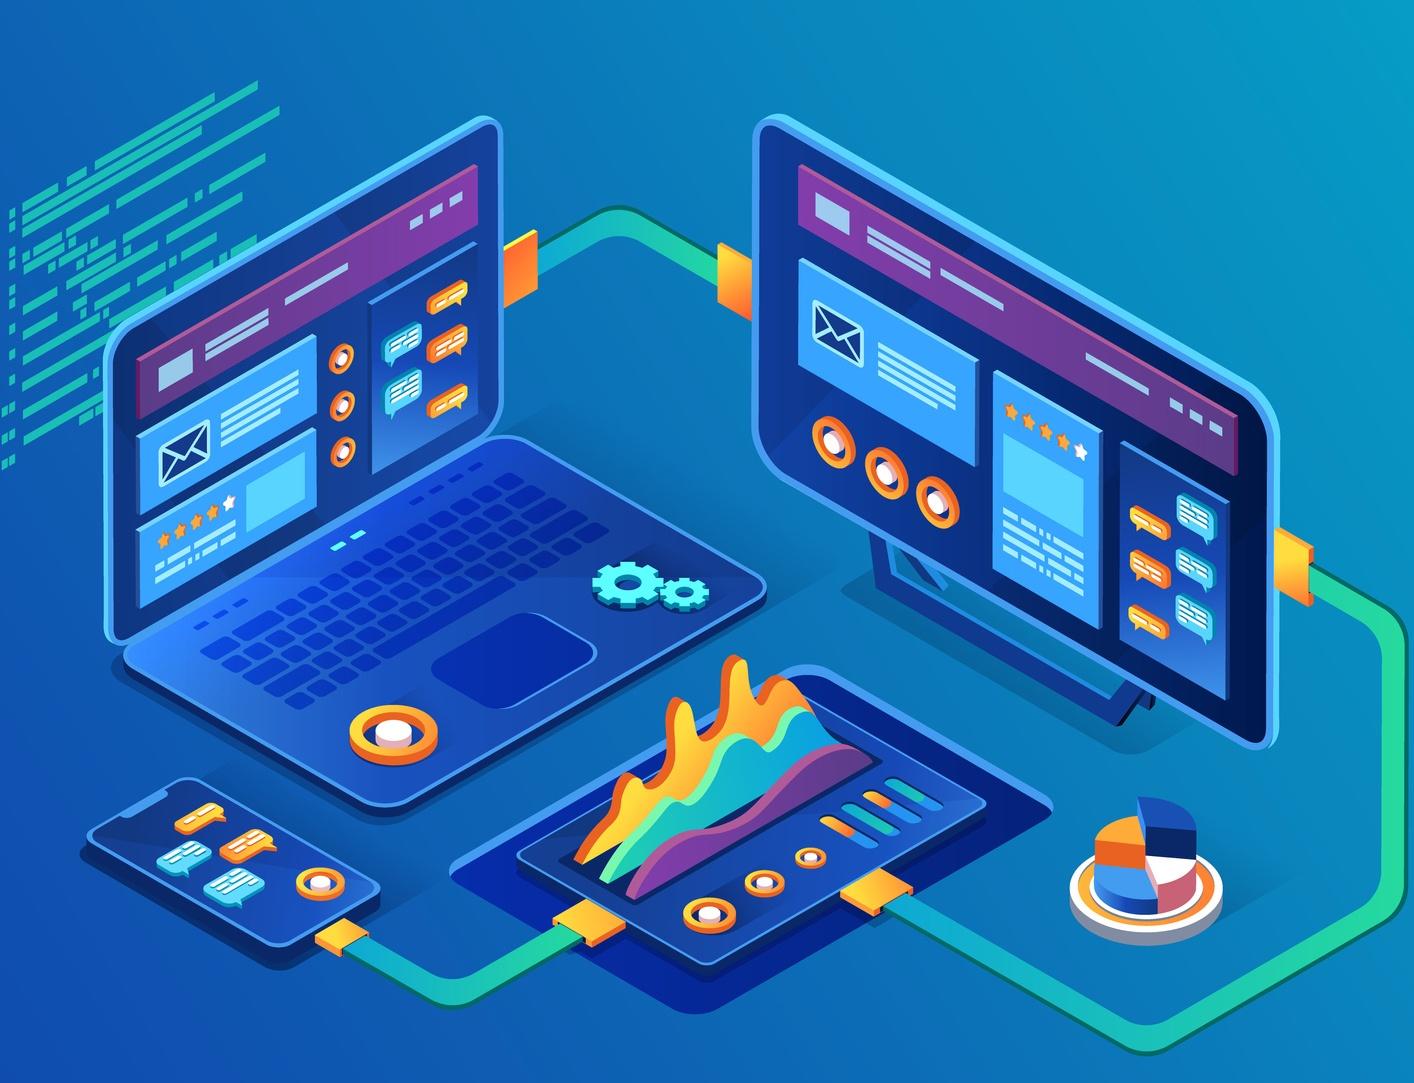 Cross Platform Mobile App Development Guide (2019) - Business of Apps